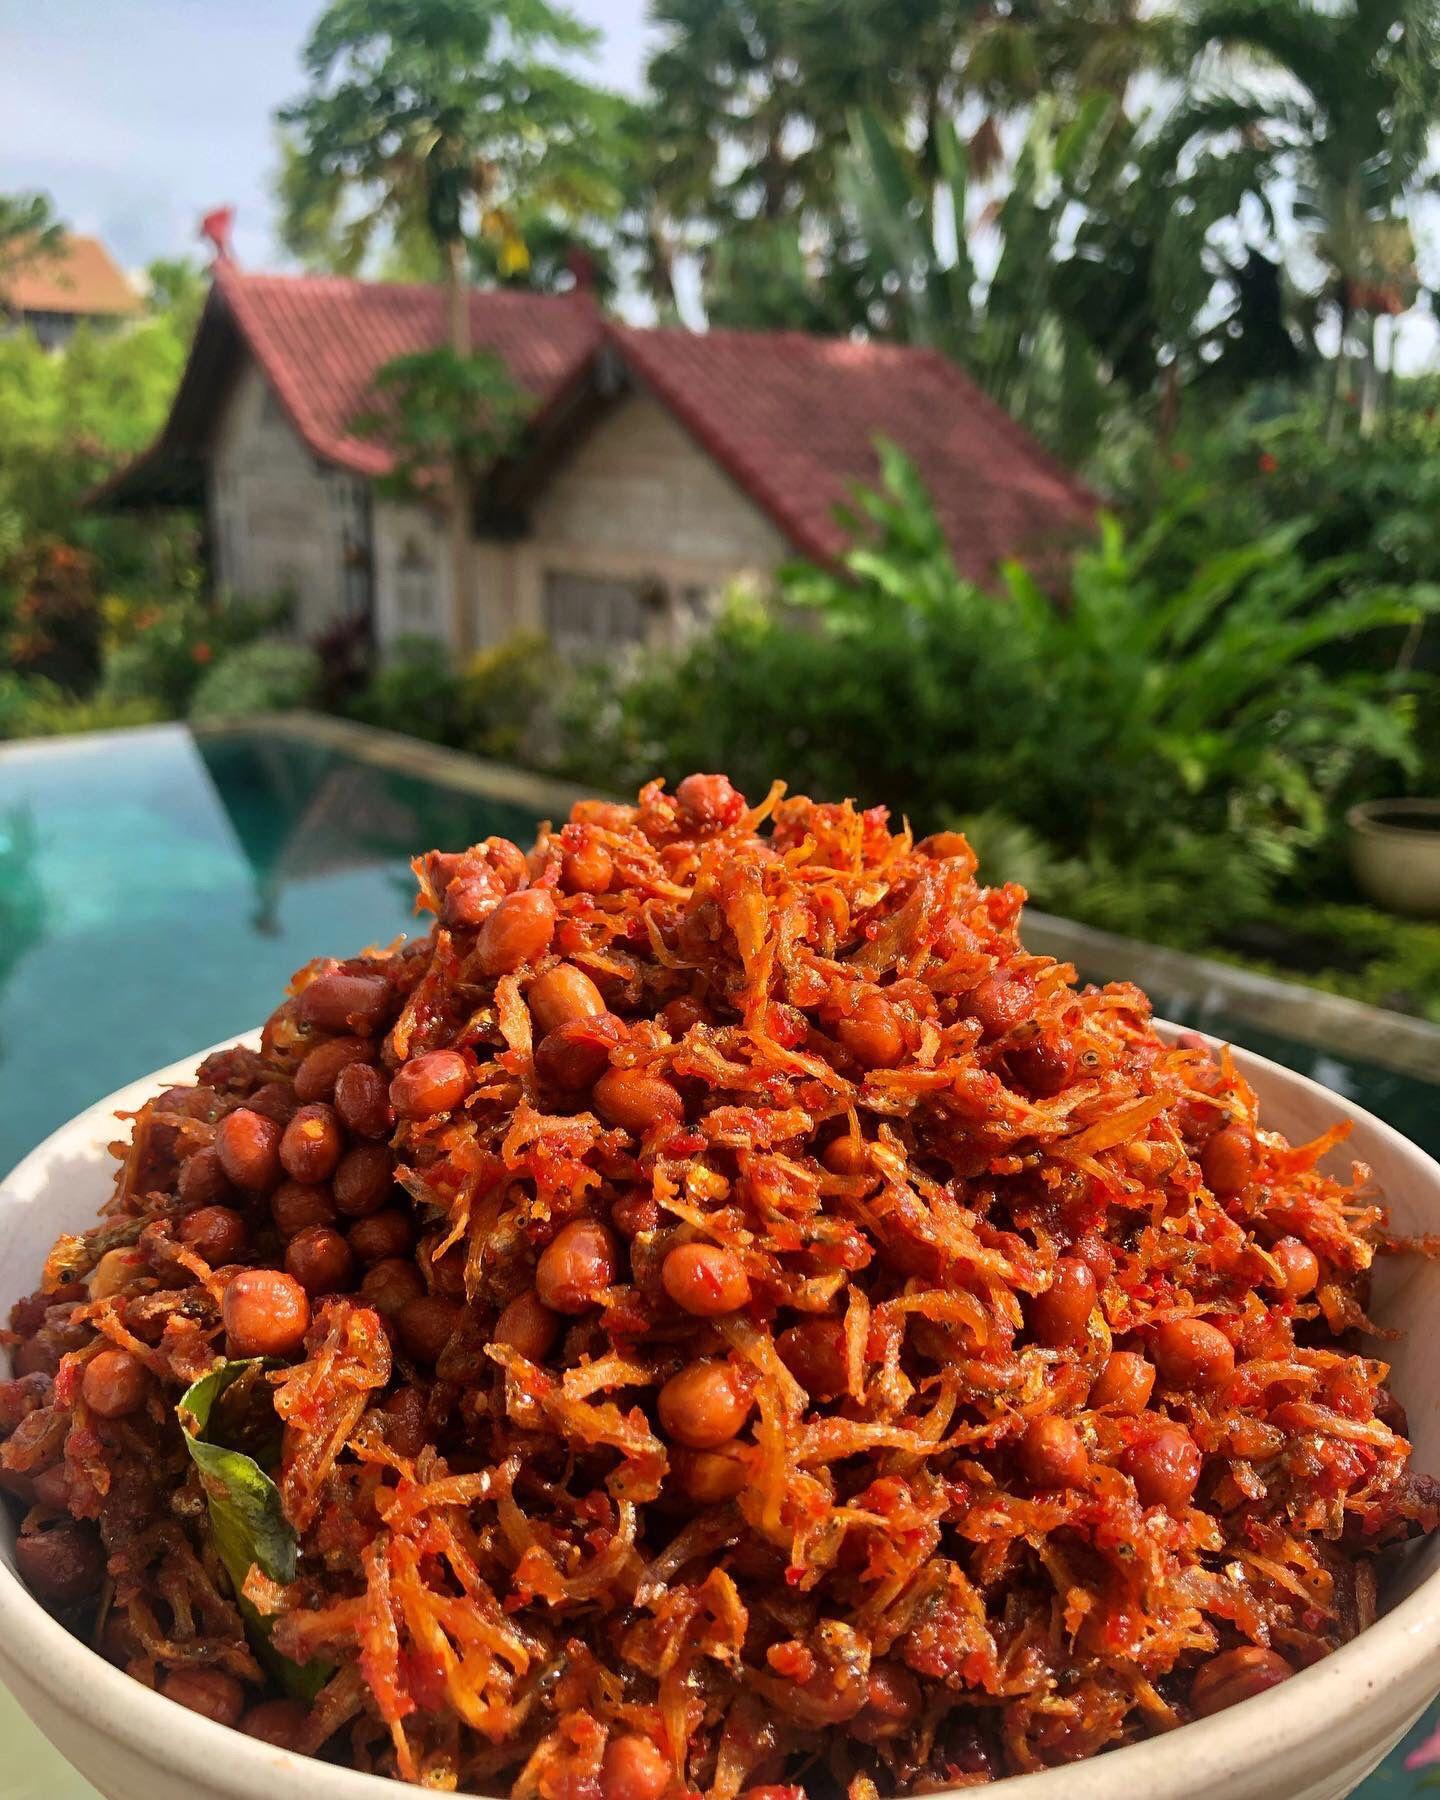 Kuliner Makanan Khas Bali Warung Teh Manis Teh manis